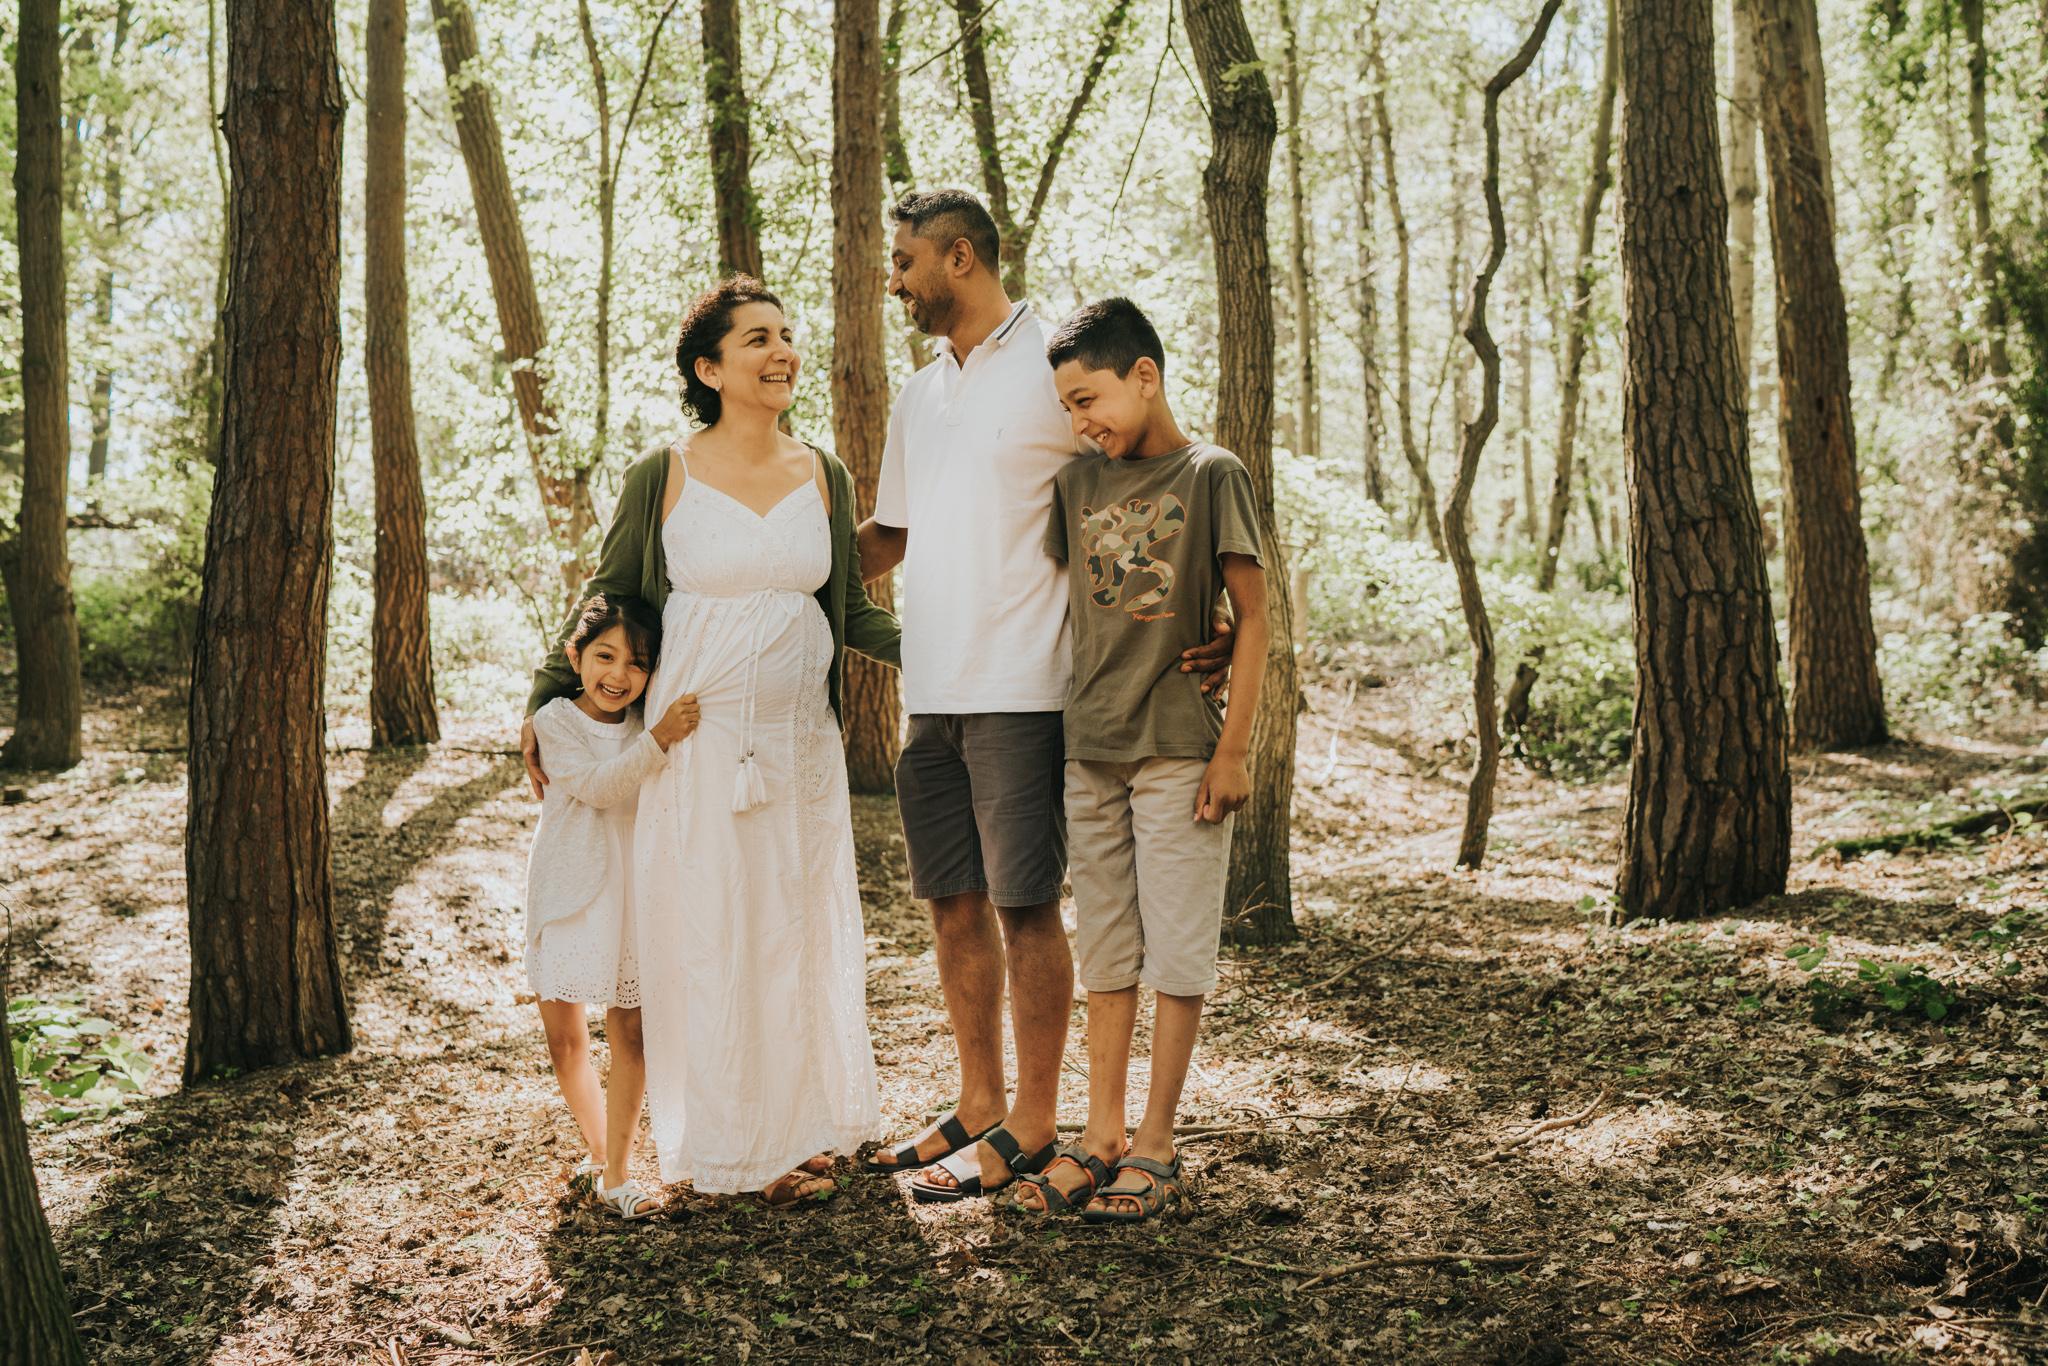 Chandrasiri-Family-Session-Woodland-Colchester-Essex-Grace-Elizabeth-Alternative-Wedding-Photographer (1 of 1).jpg (1 of 34).jpg